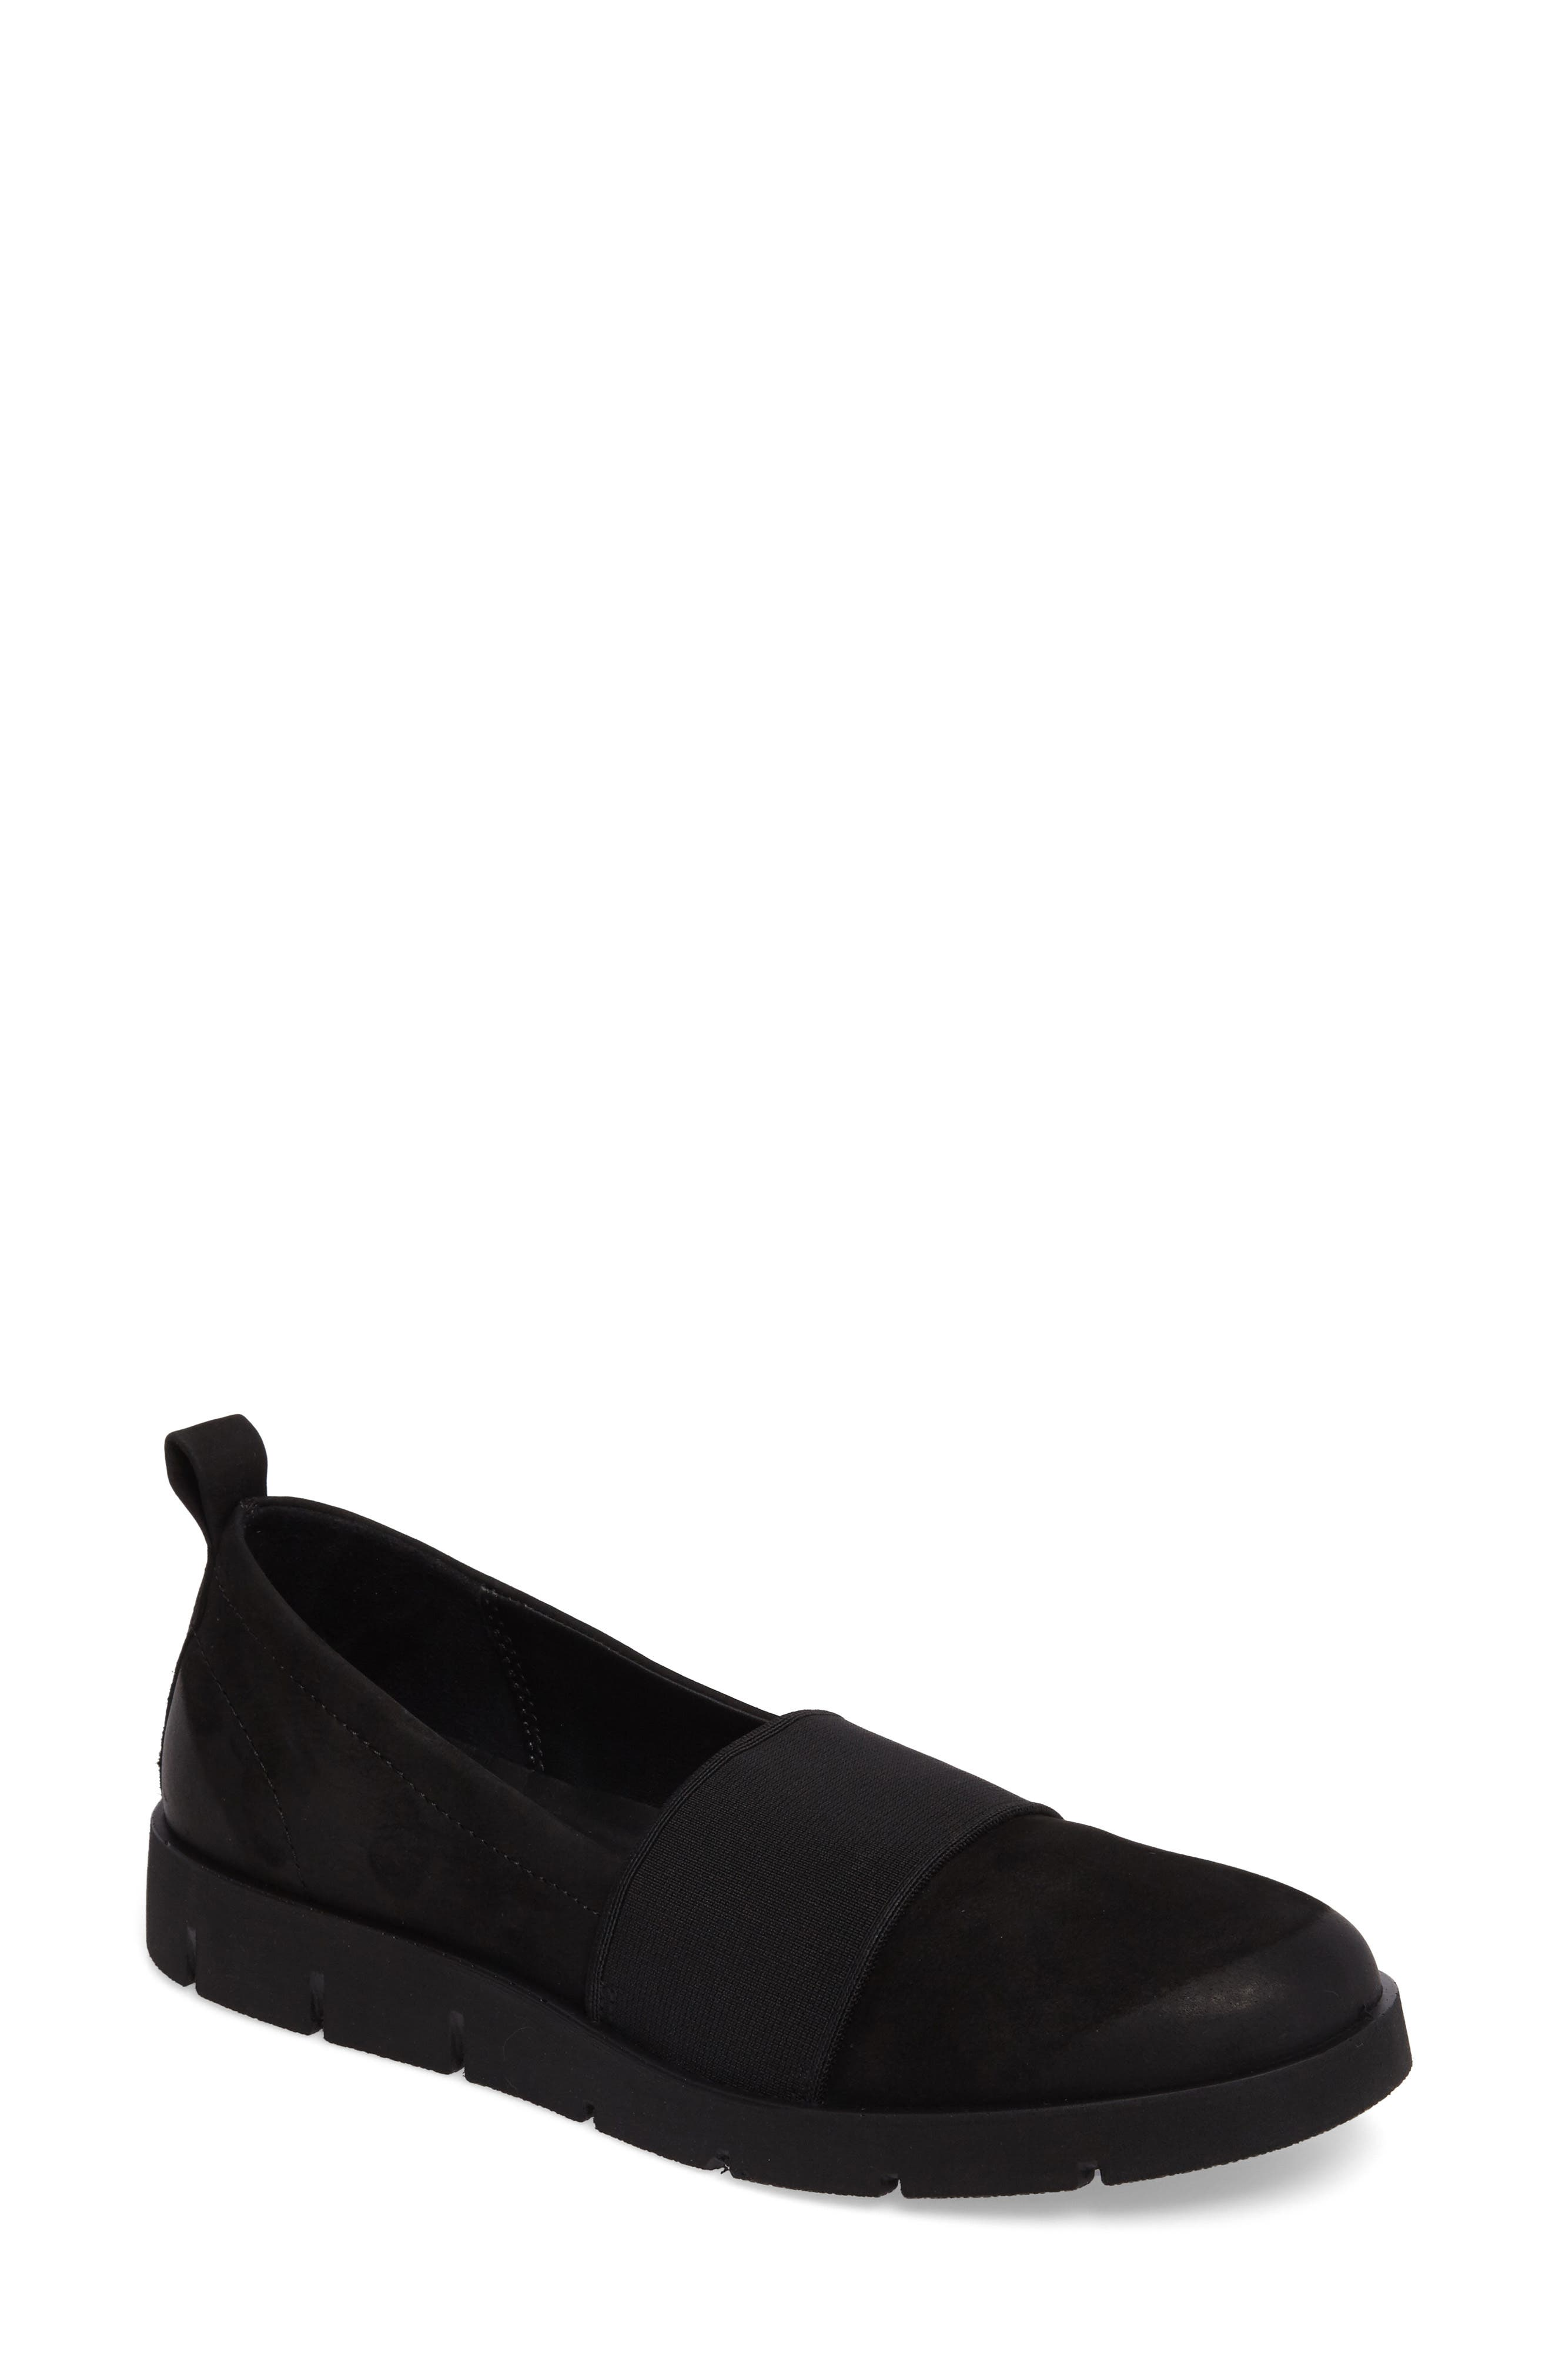 Main Image - ECCO Bella Slip-On Sneaker (Women)